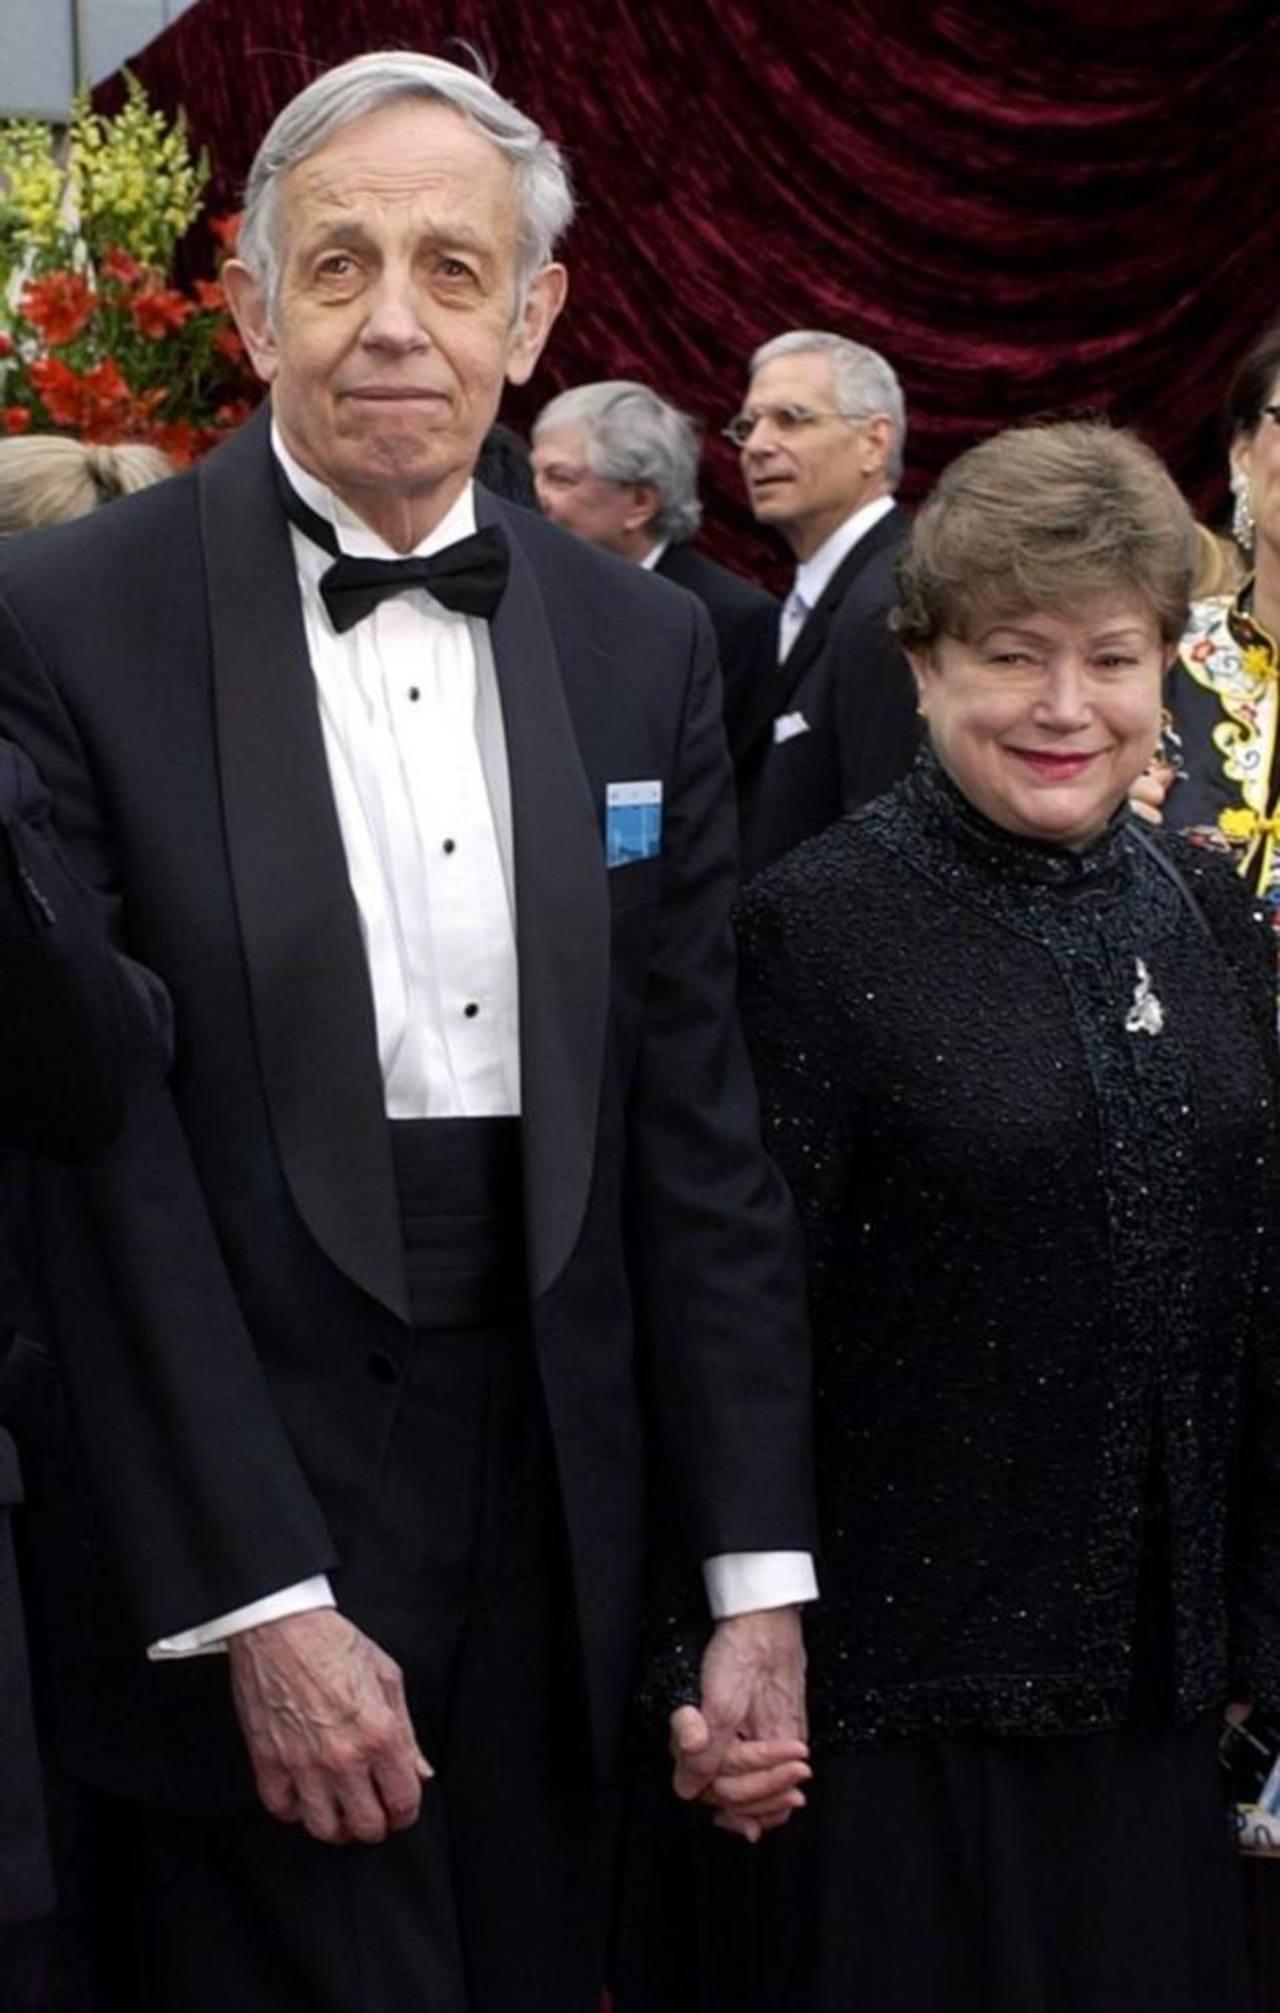 La pareja entrando al Teatro Kodak para la gala de los premios Óscar 2002. Foto EDH /AP